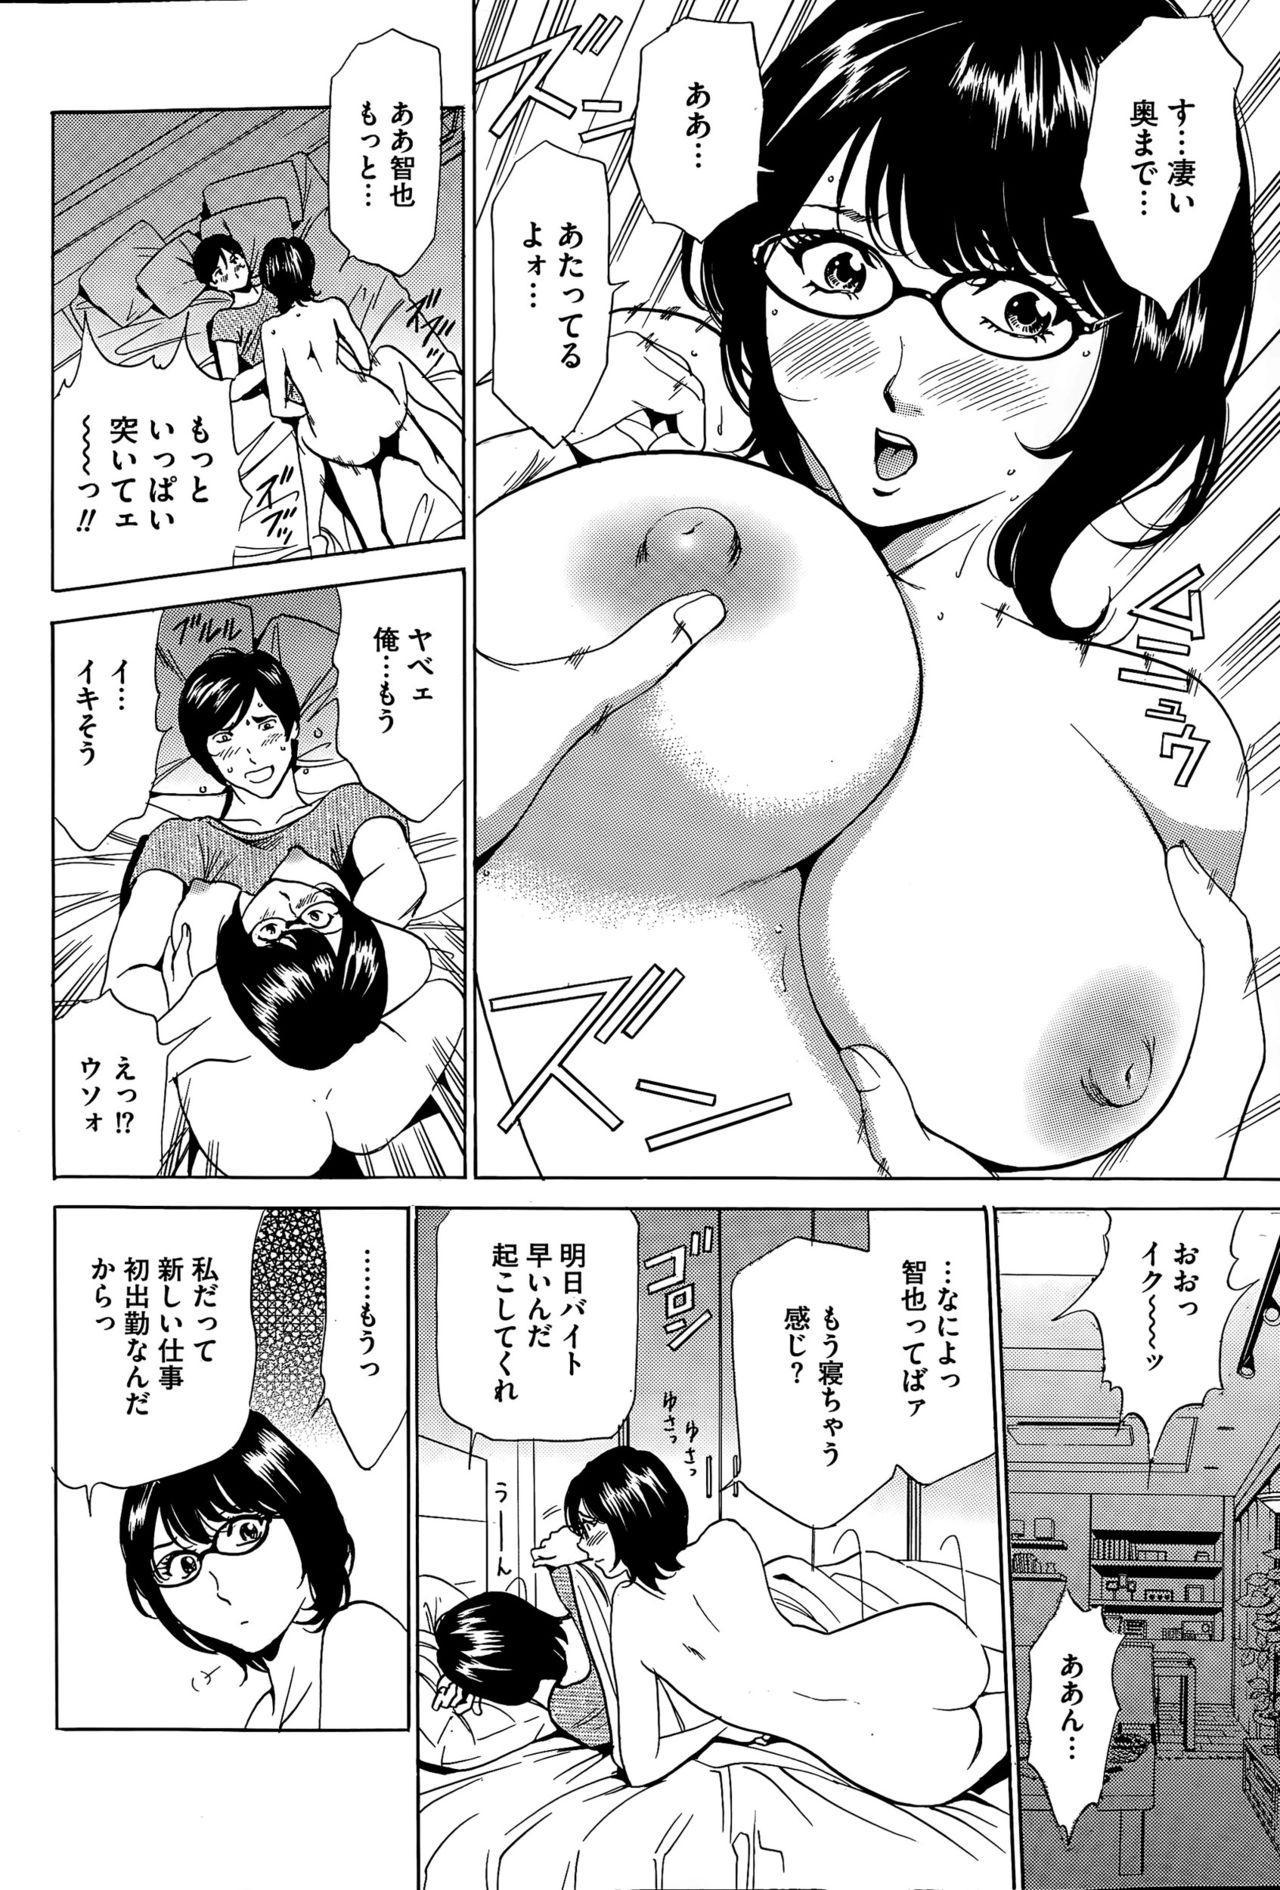 Wa Usuki Ipa a 1-10 2